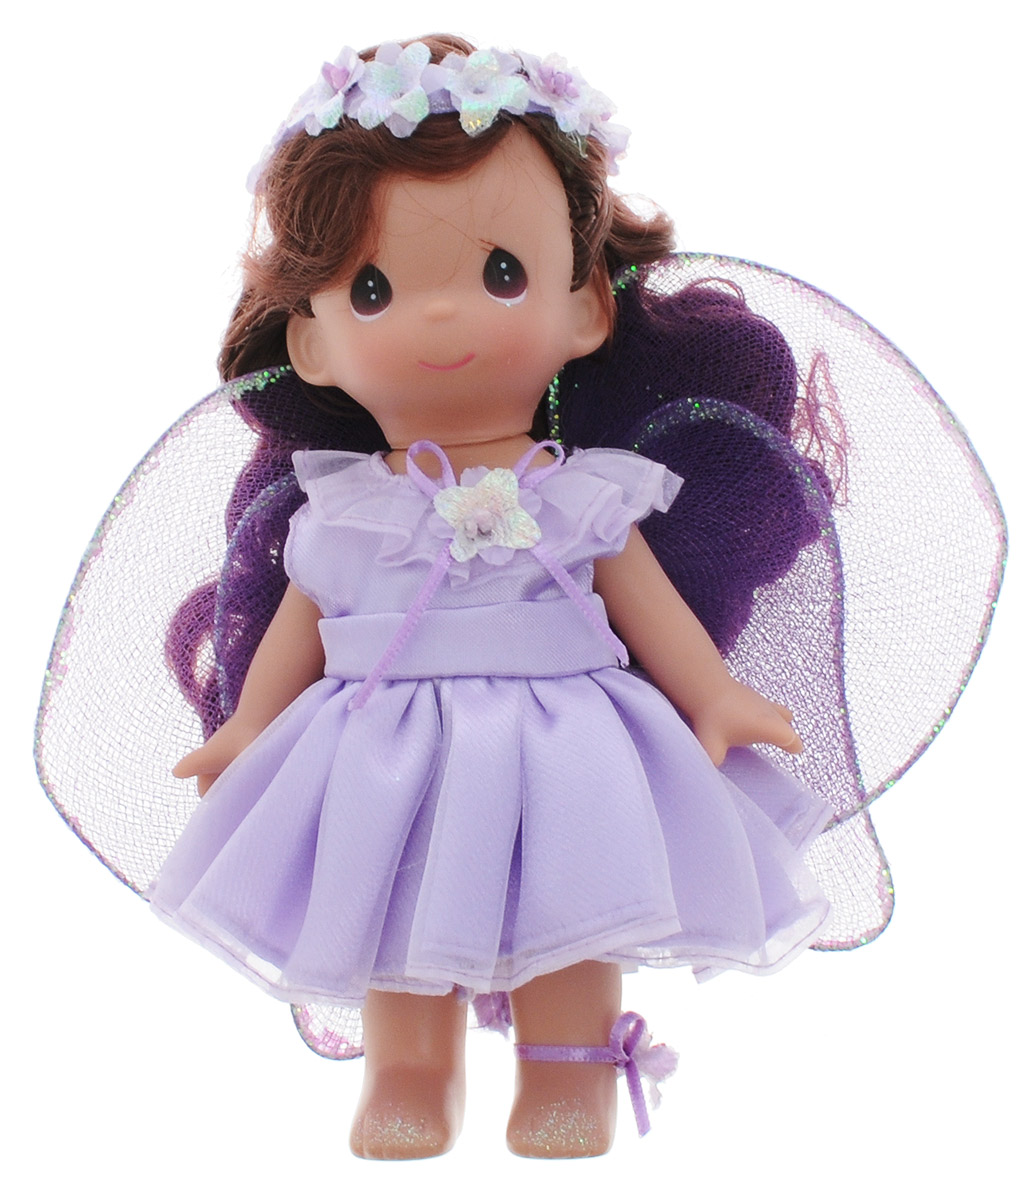 Precious Moments Мини-кукла Фея Фиалка precious moments мини кукла колокольчик